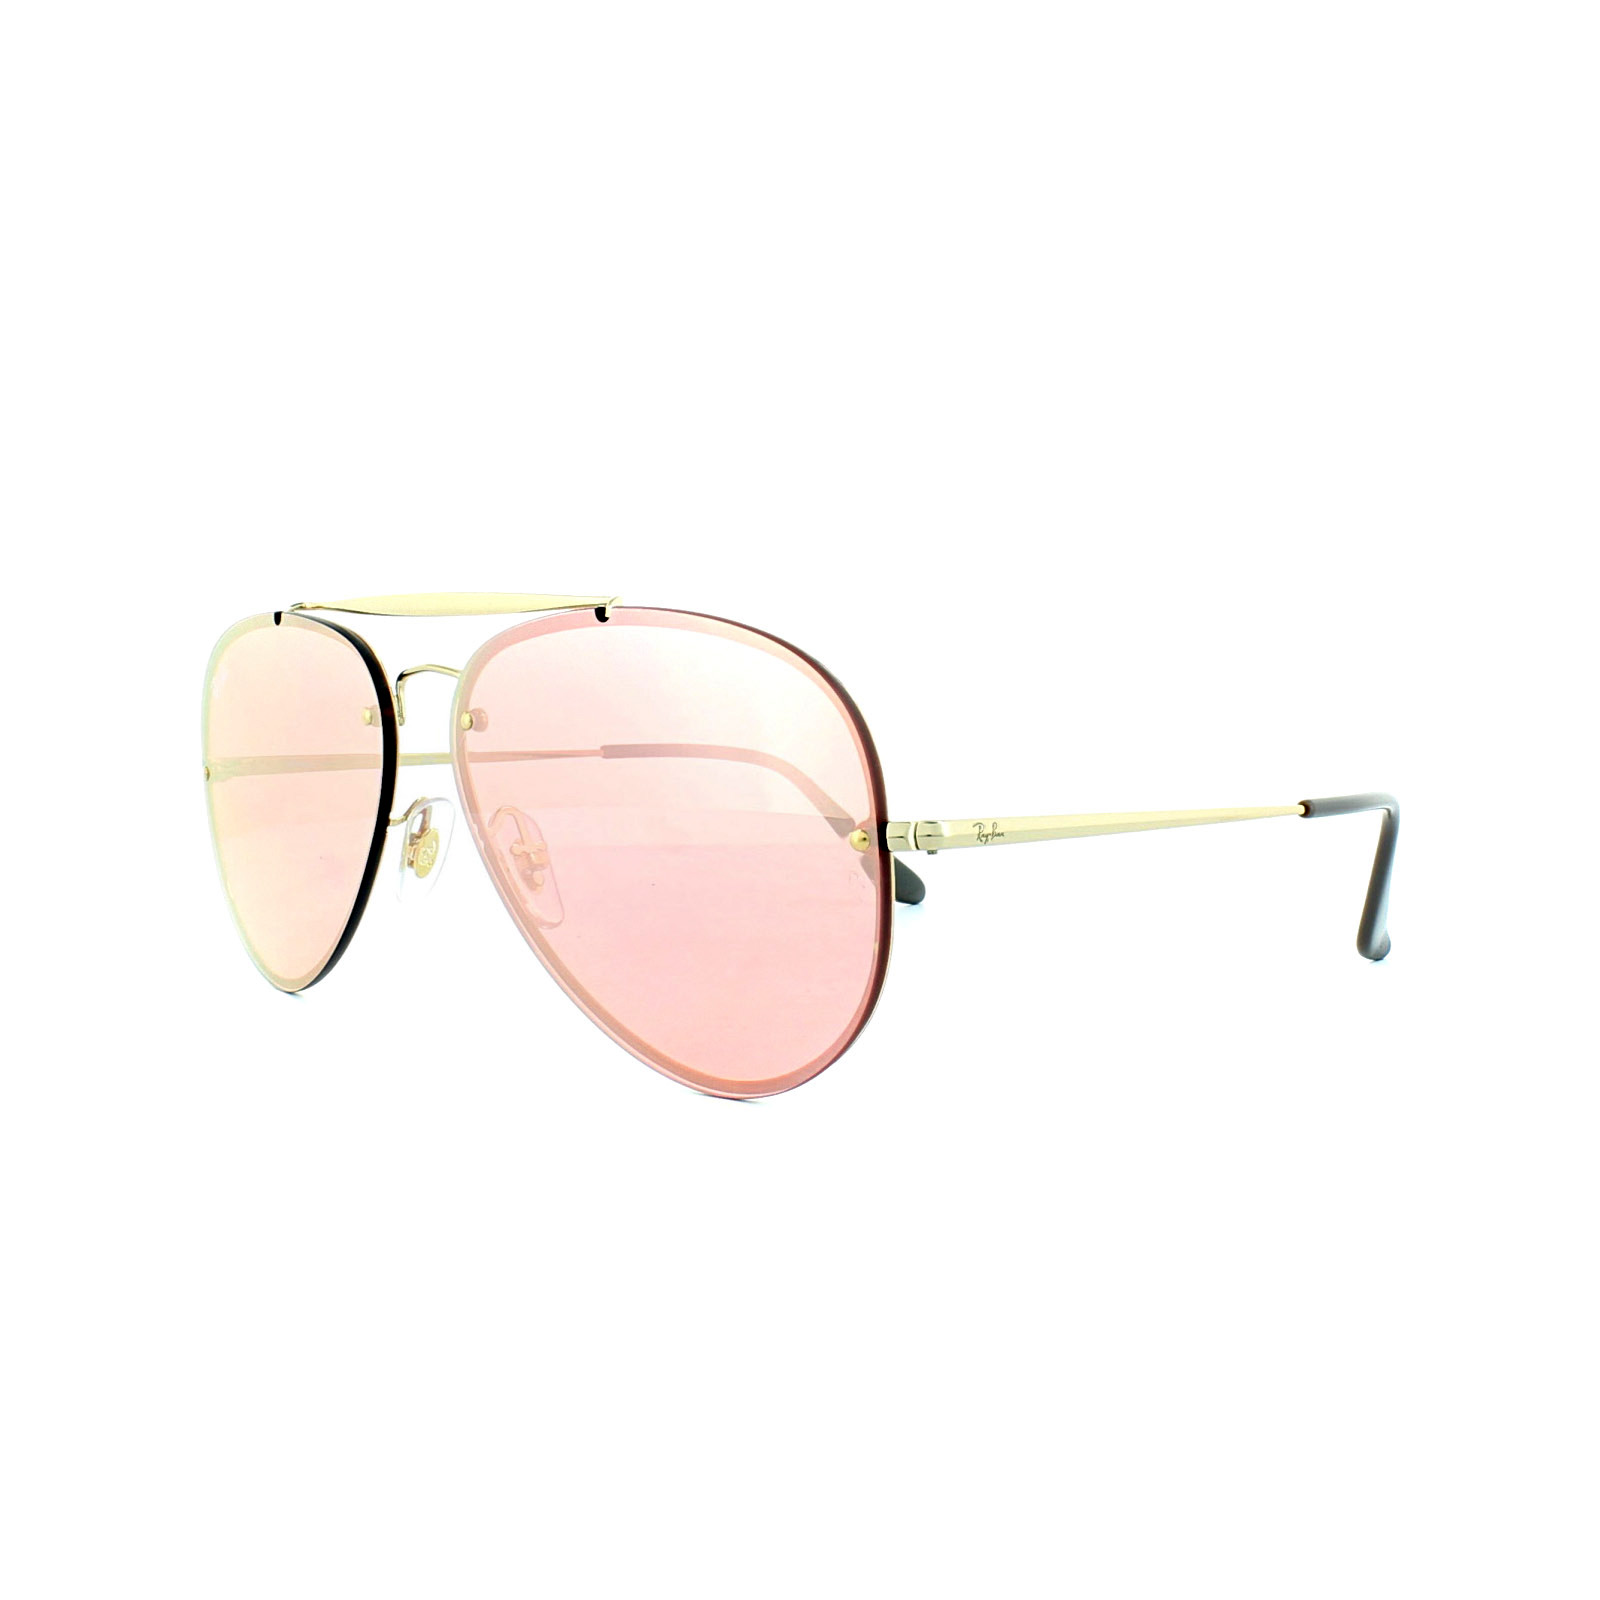 a0371413f1 Sentinel Ray-Ban Sunglasses Blaze Aviator 3584N 9052E4 Gold Pink Mirror